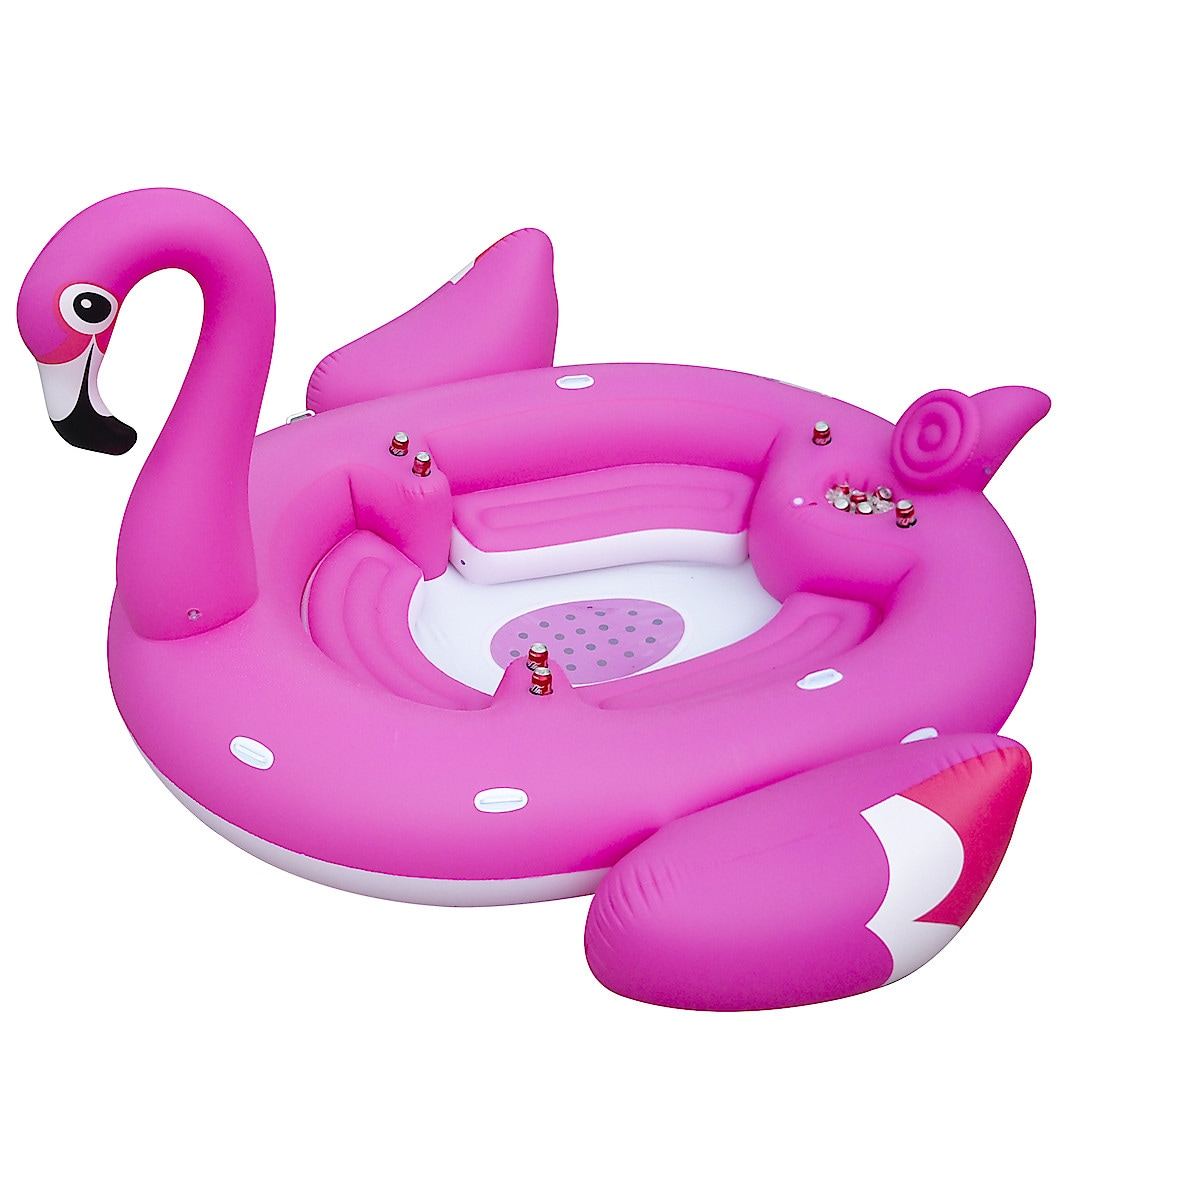 Uppblåsbar flotte Mega Flamingo